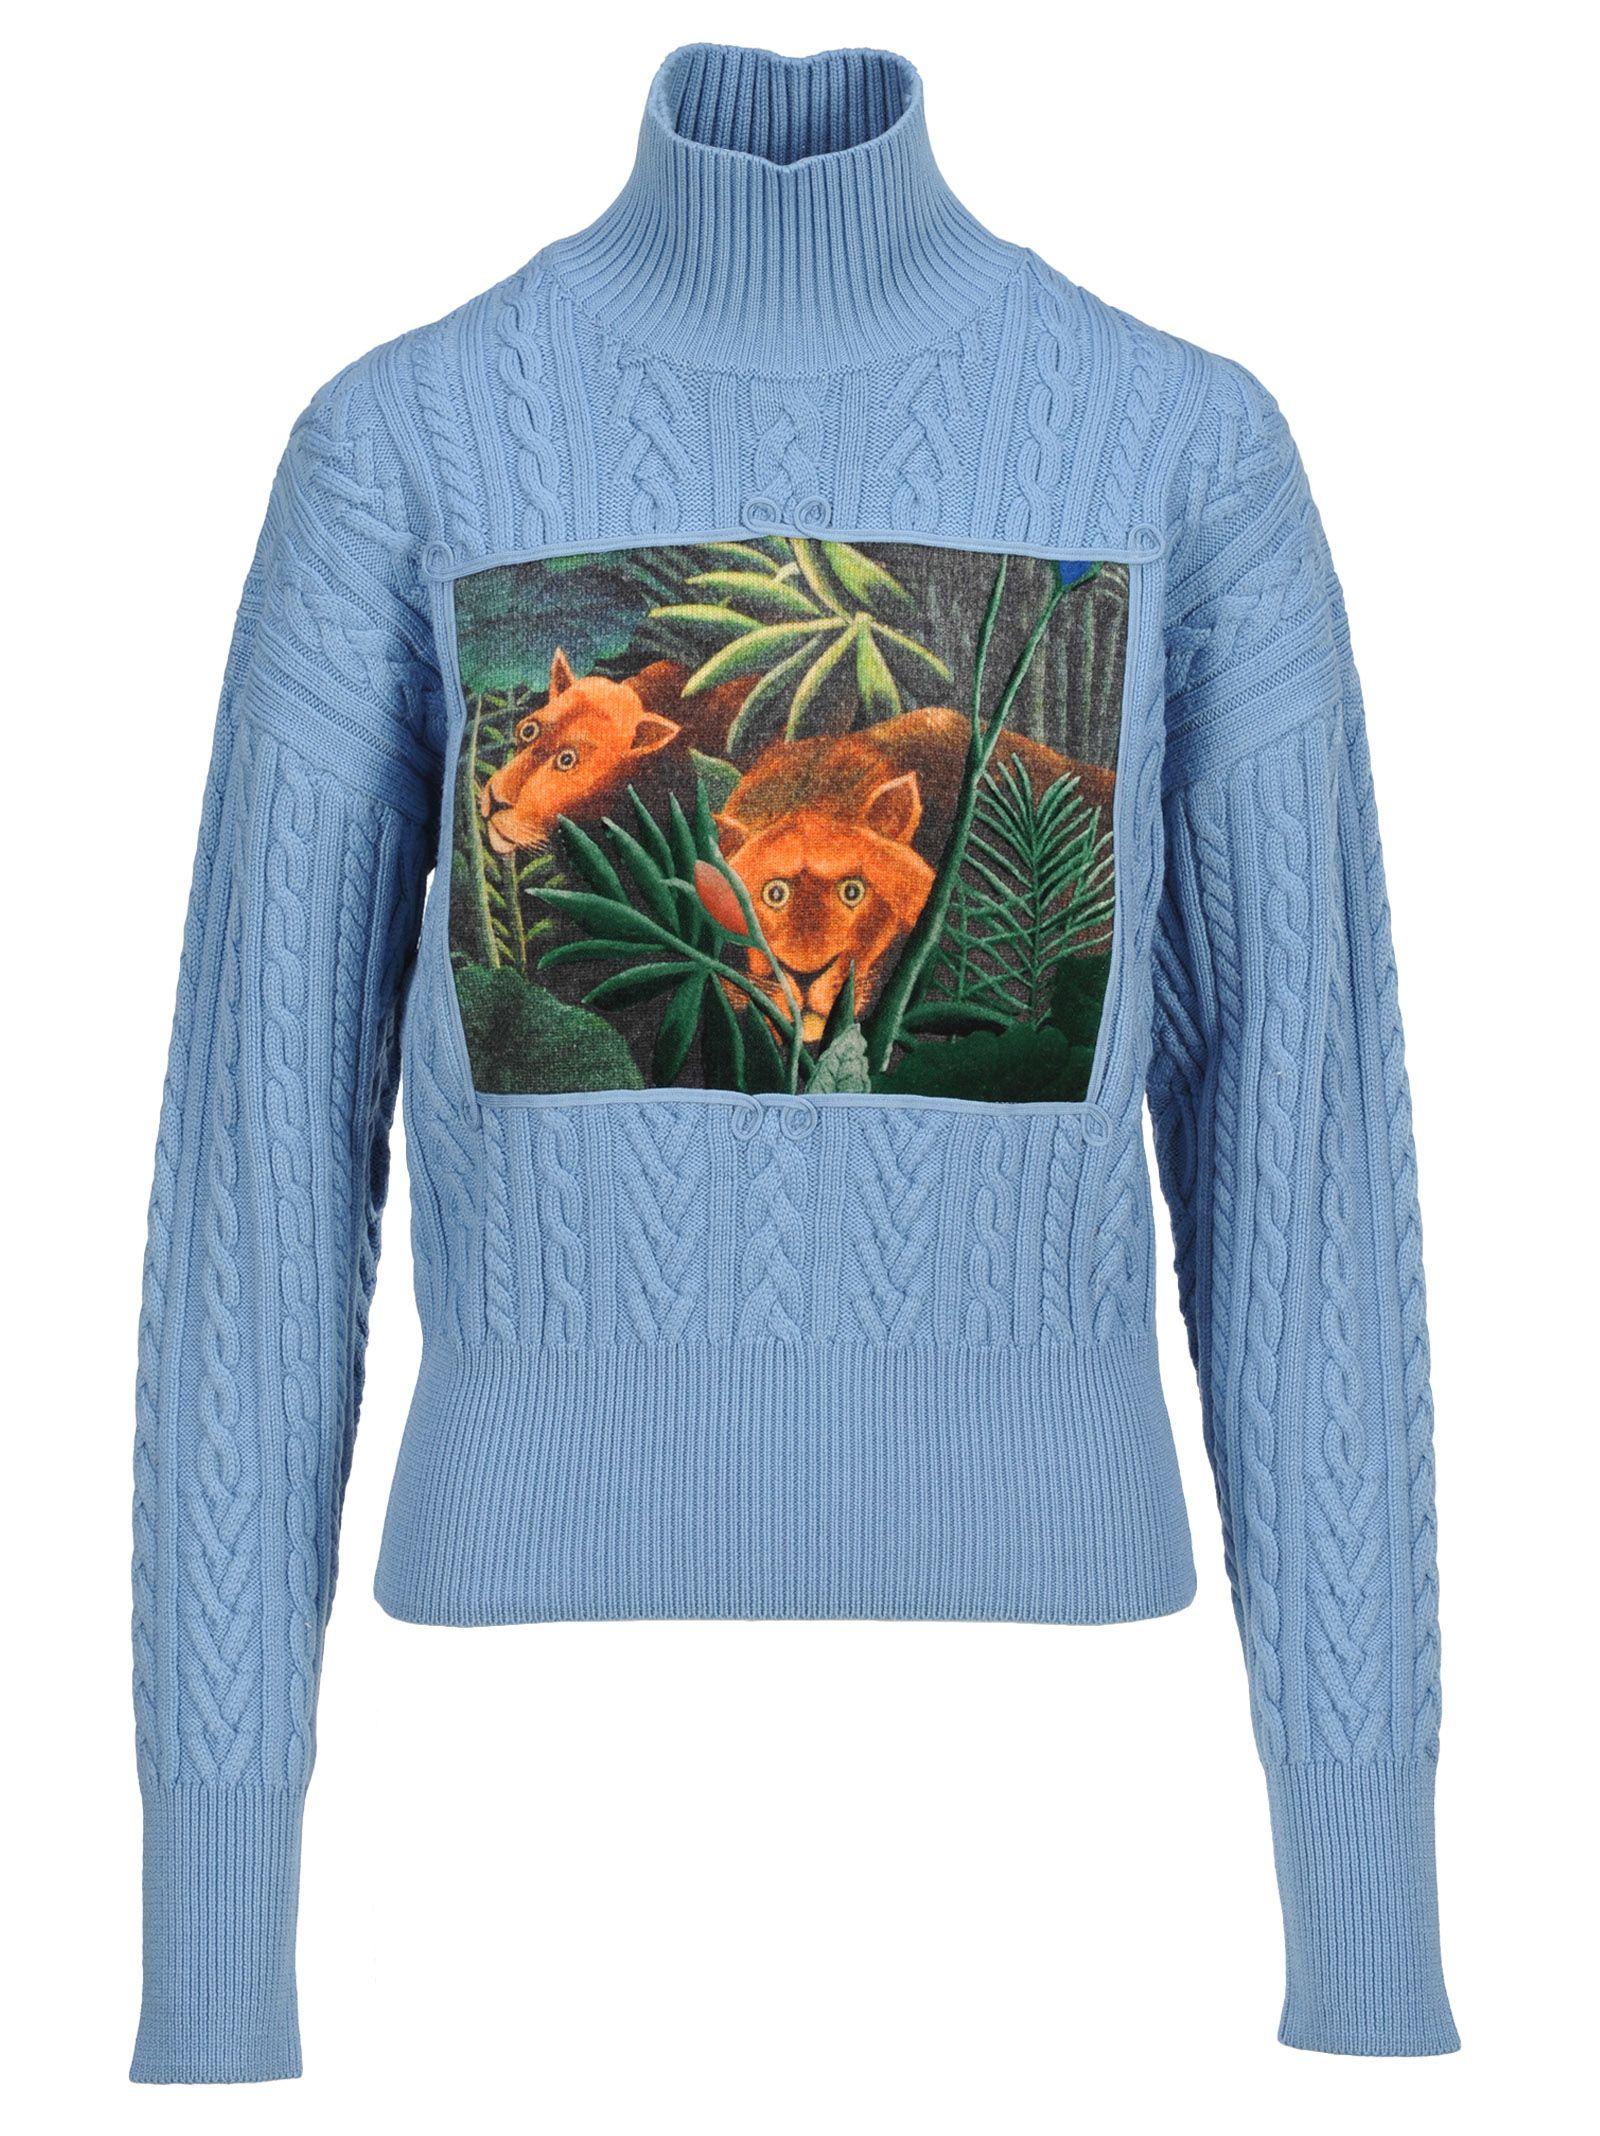 Kenzo The Memento High Collar Sweater